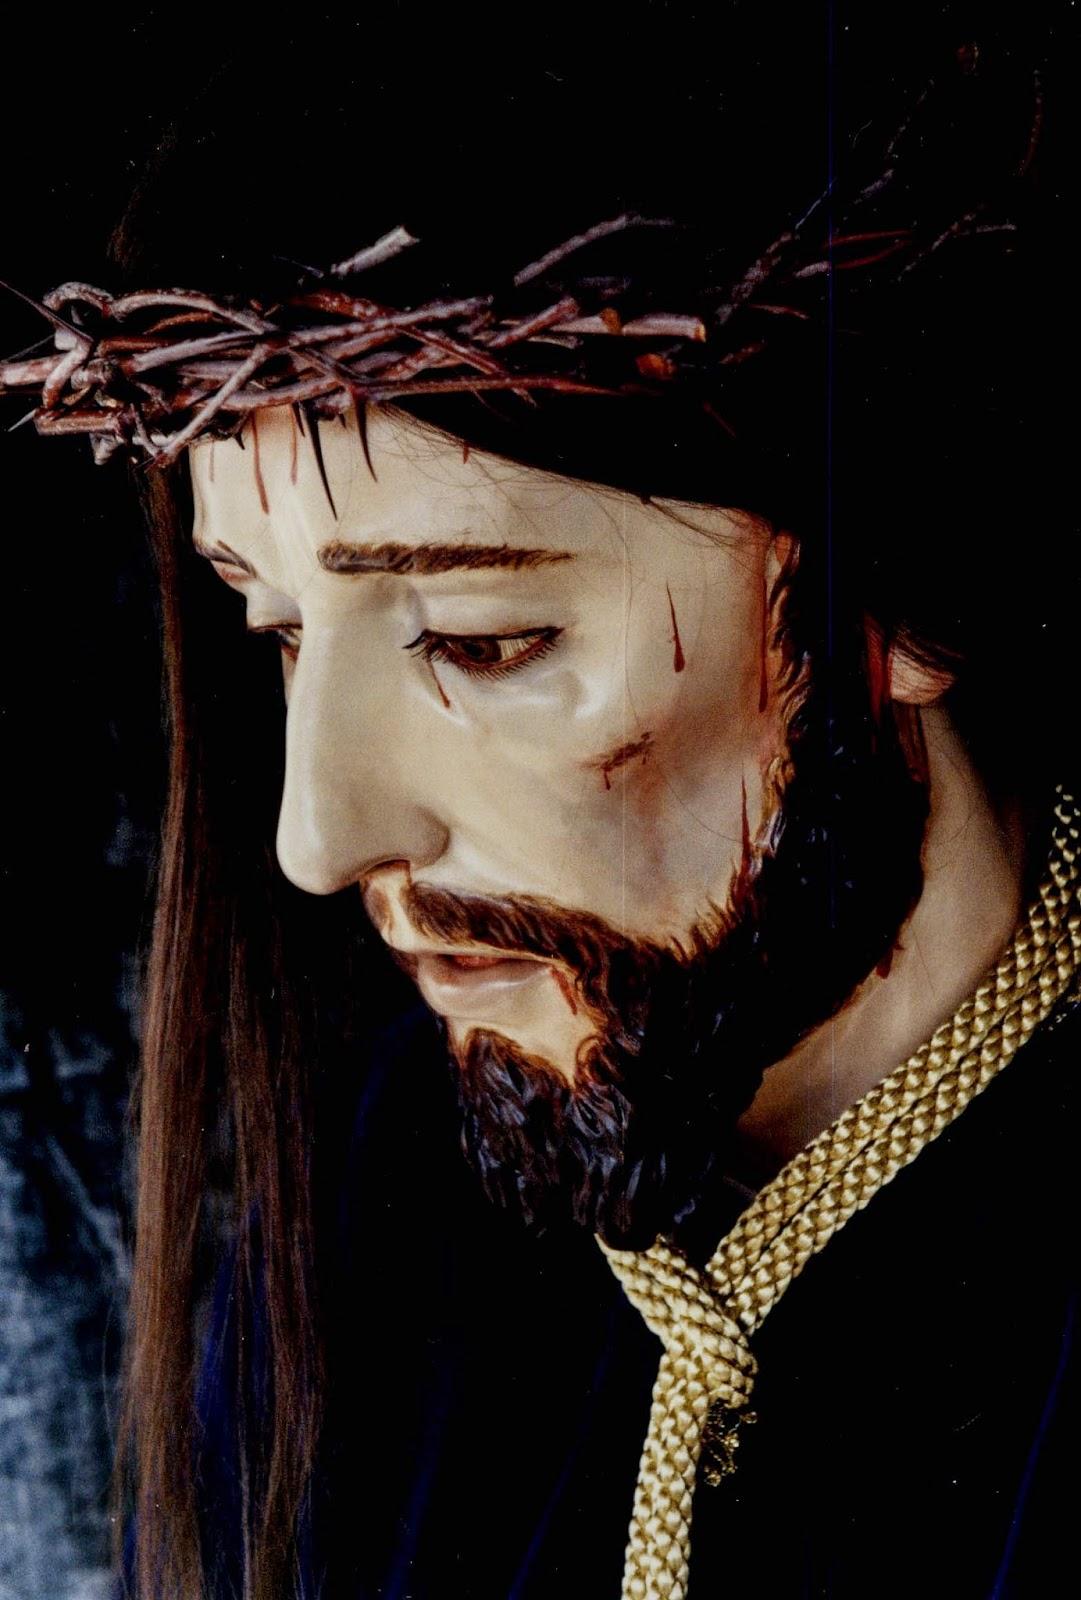 Cristo Misericordia La Algaida Arturo Serra Murcia escultura 4